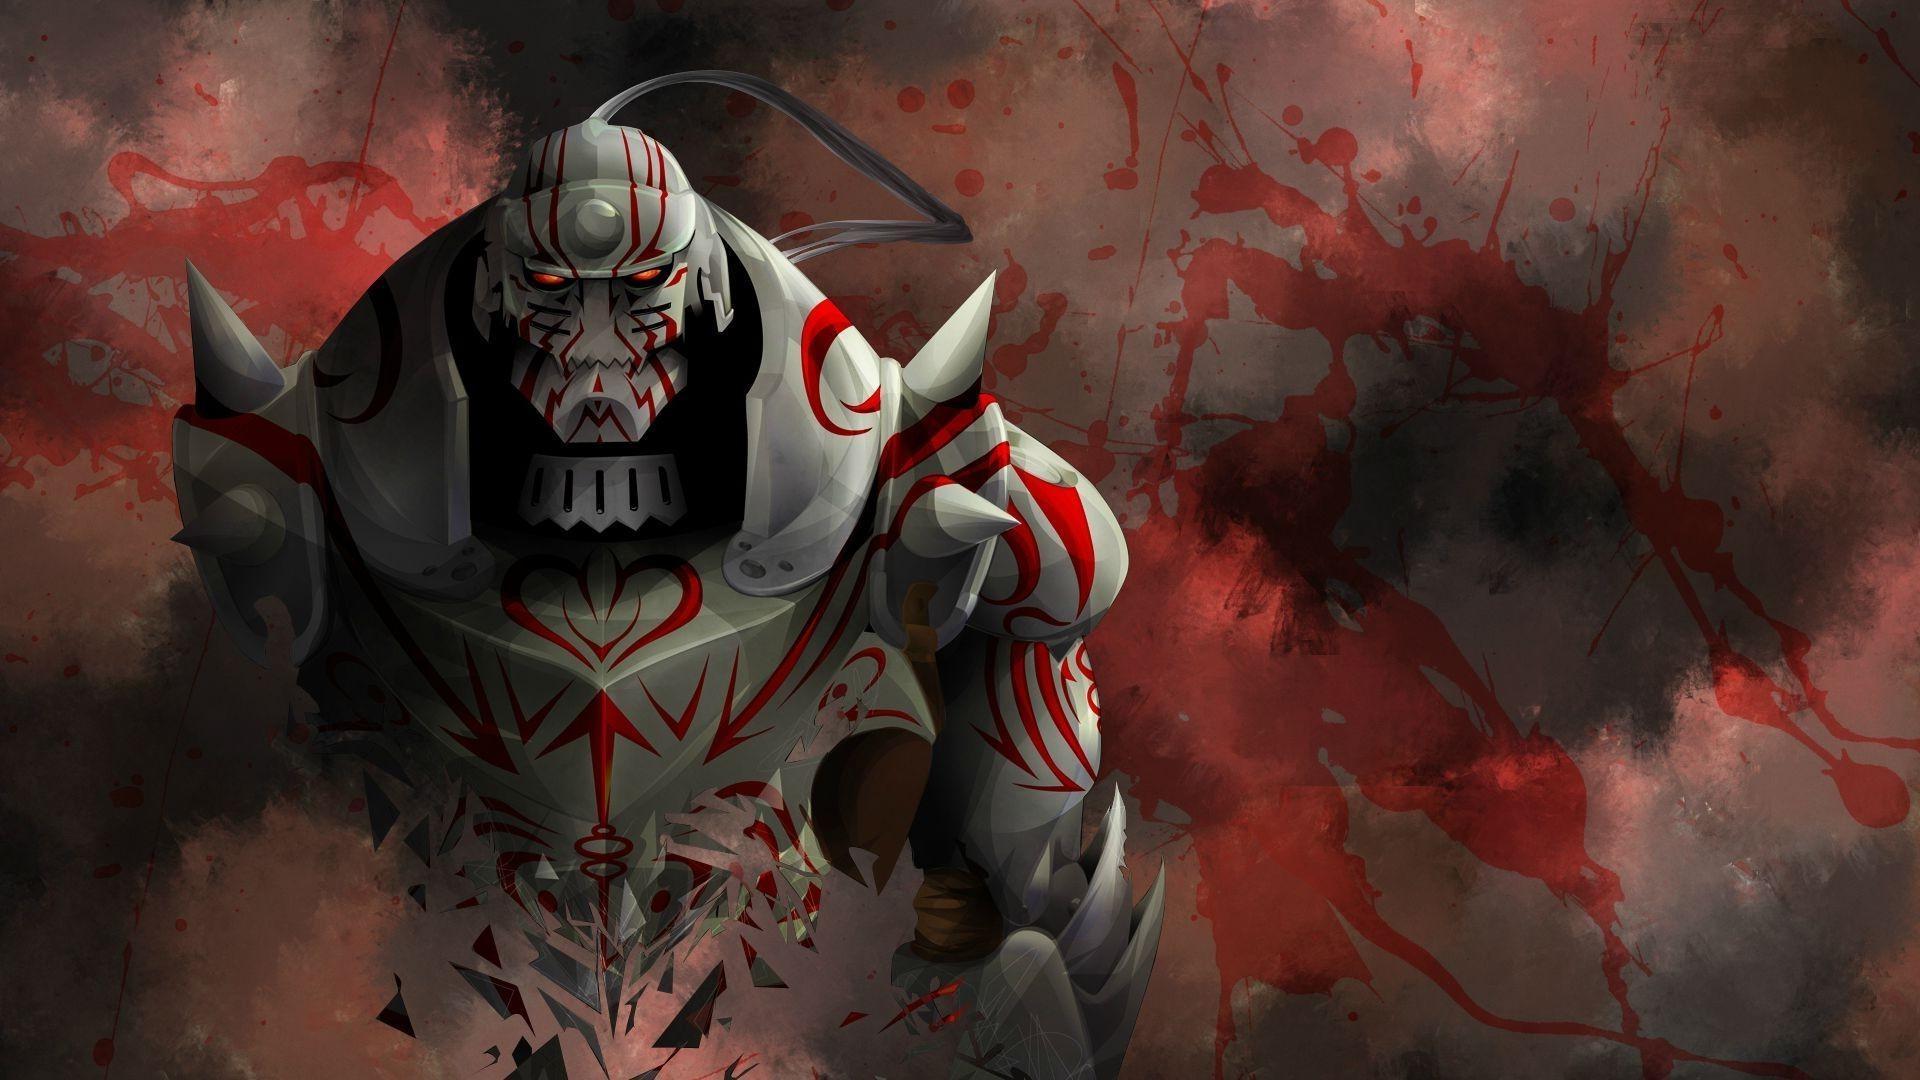 Fullmetal Alchemist Brotherhood Wallpapers Top Free Fullmetal